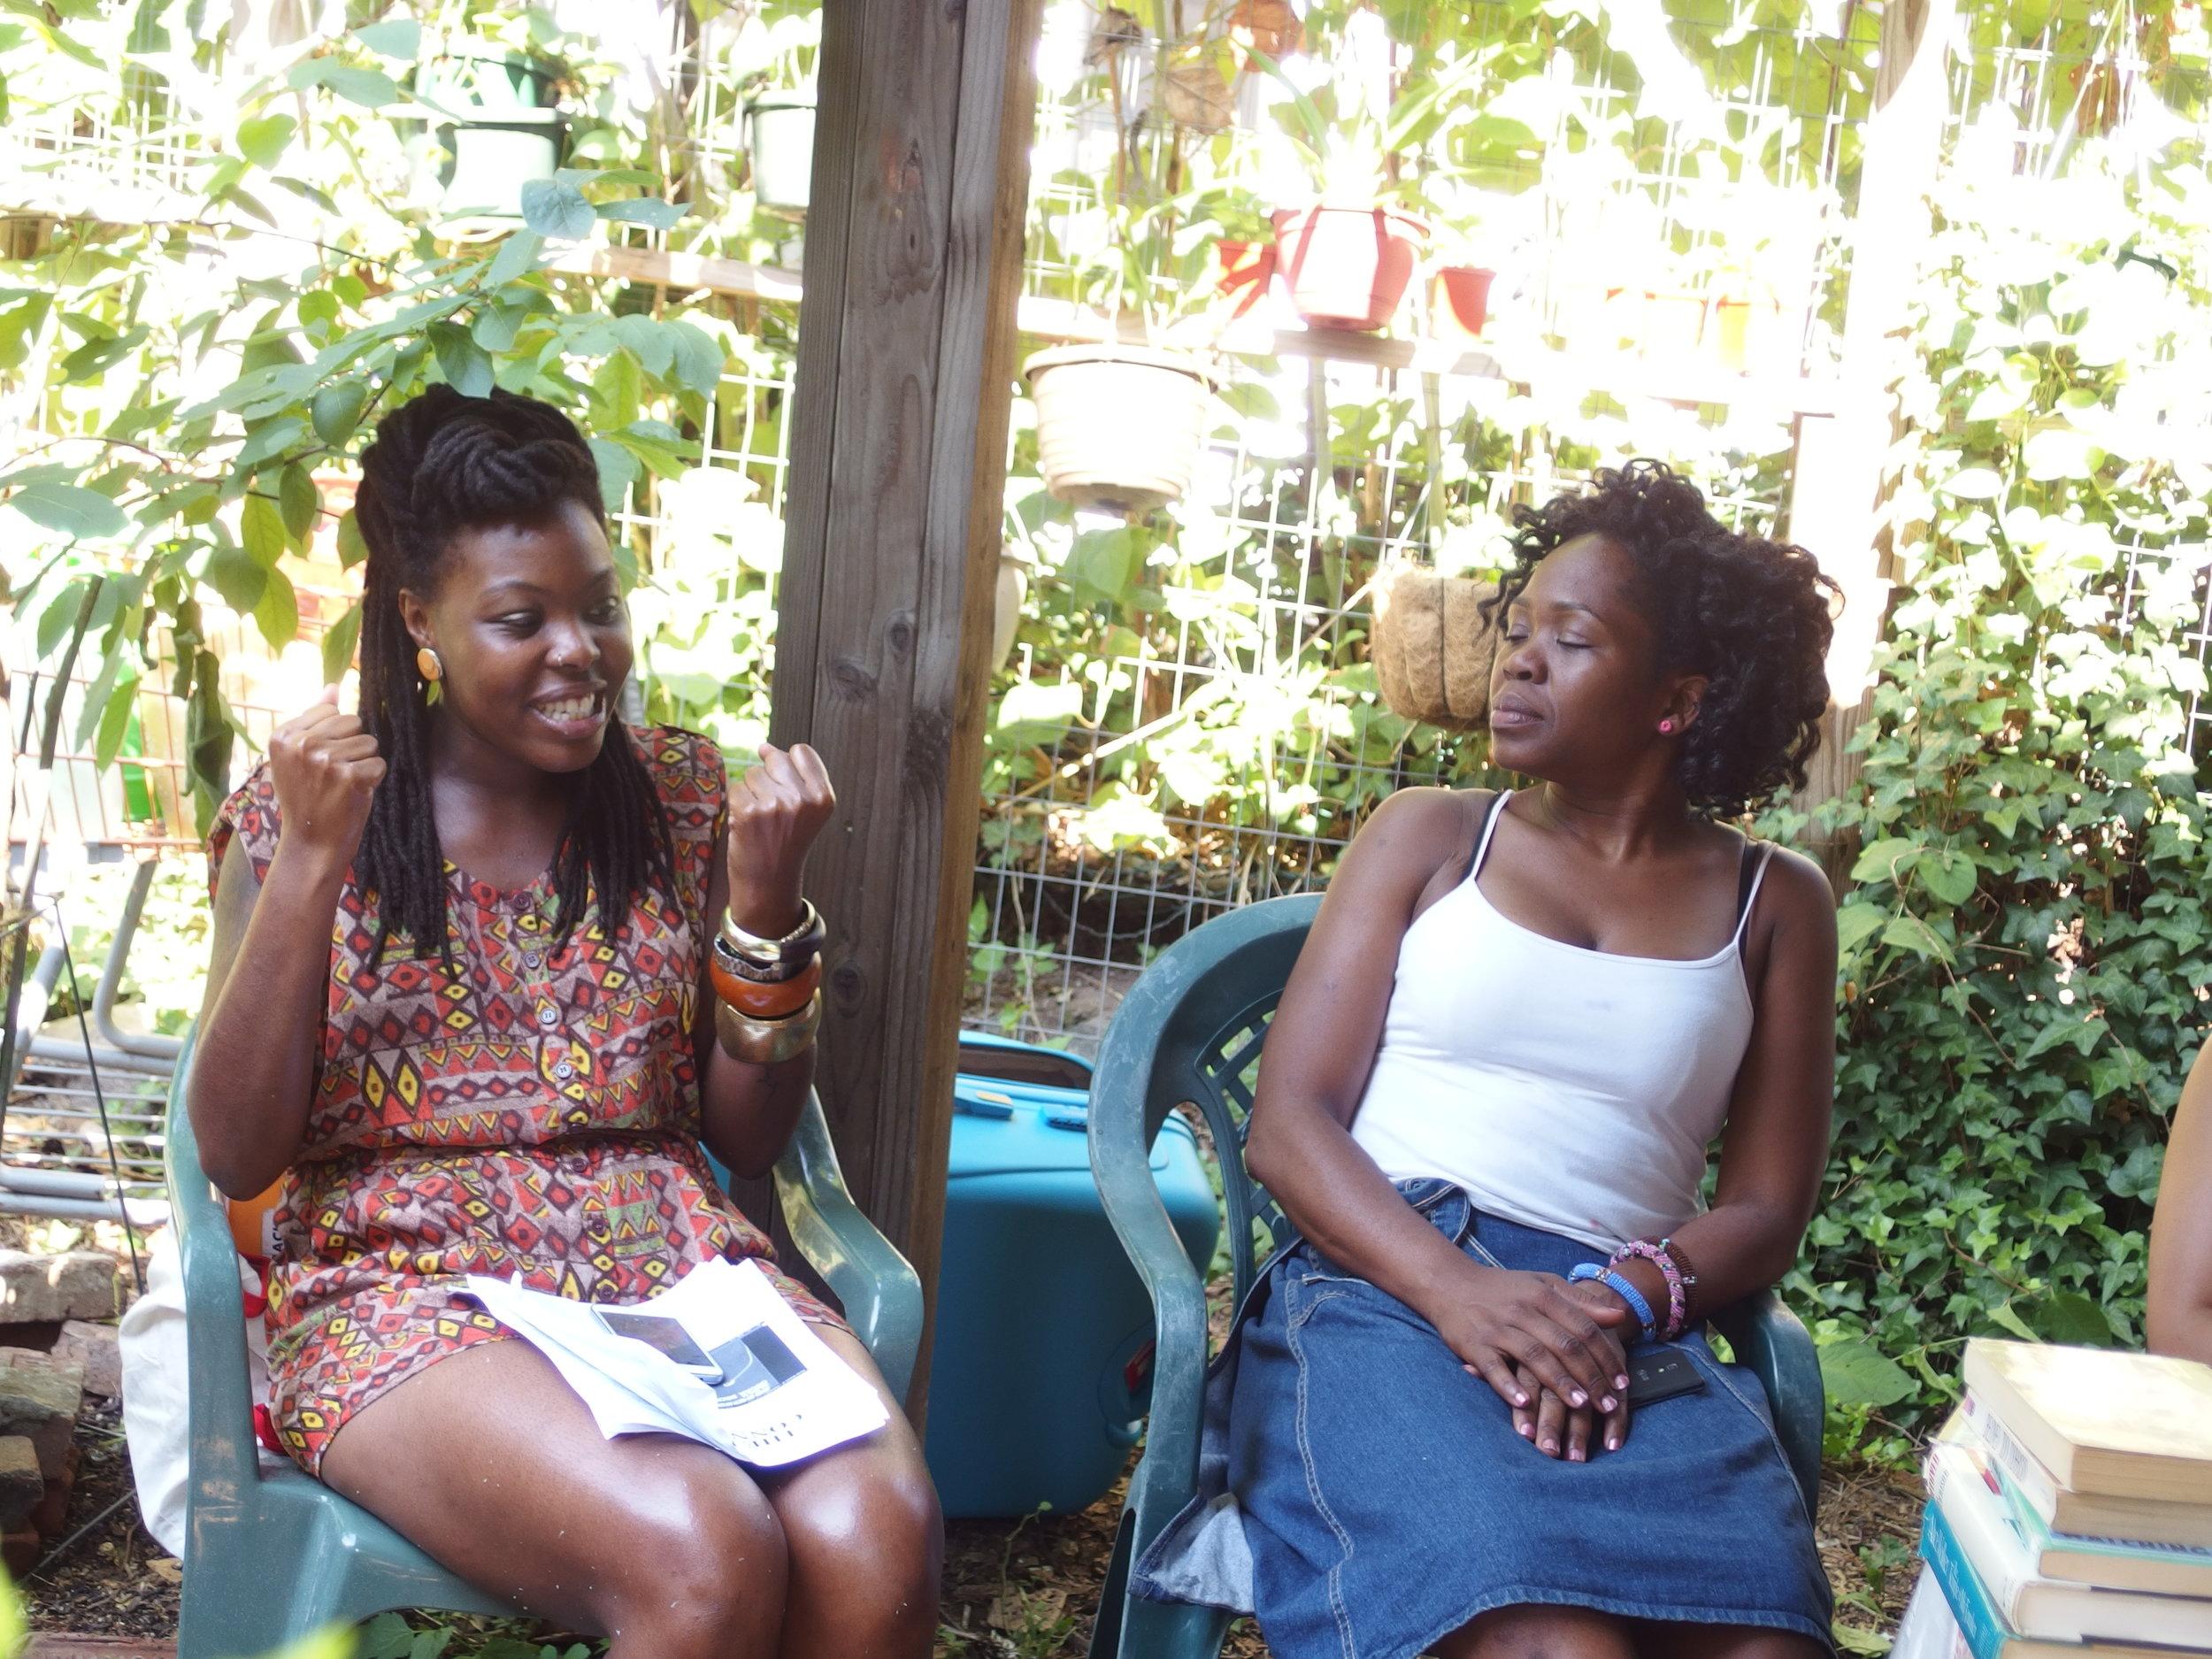 little-free-black-womens-library_20328525234_o.jpg